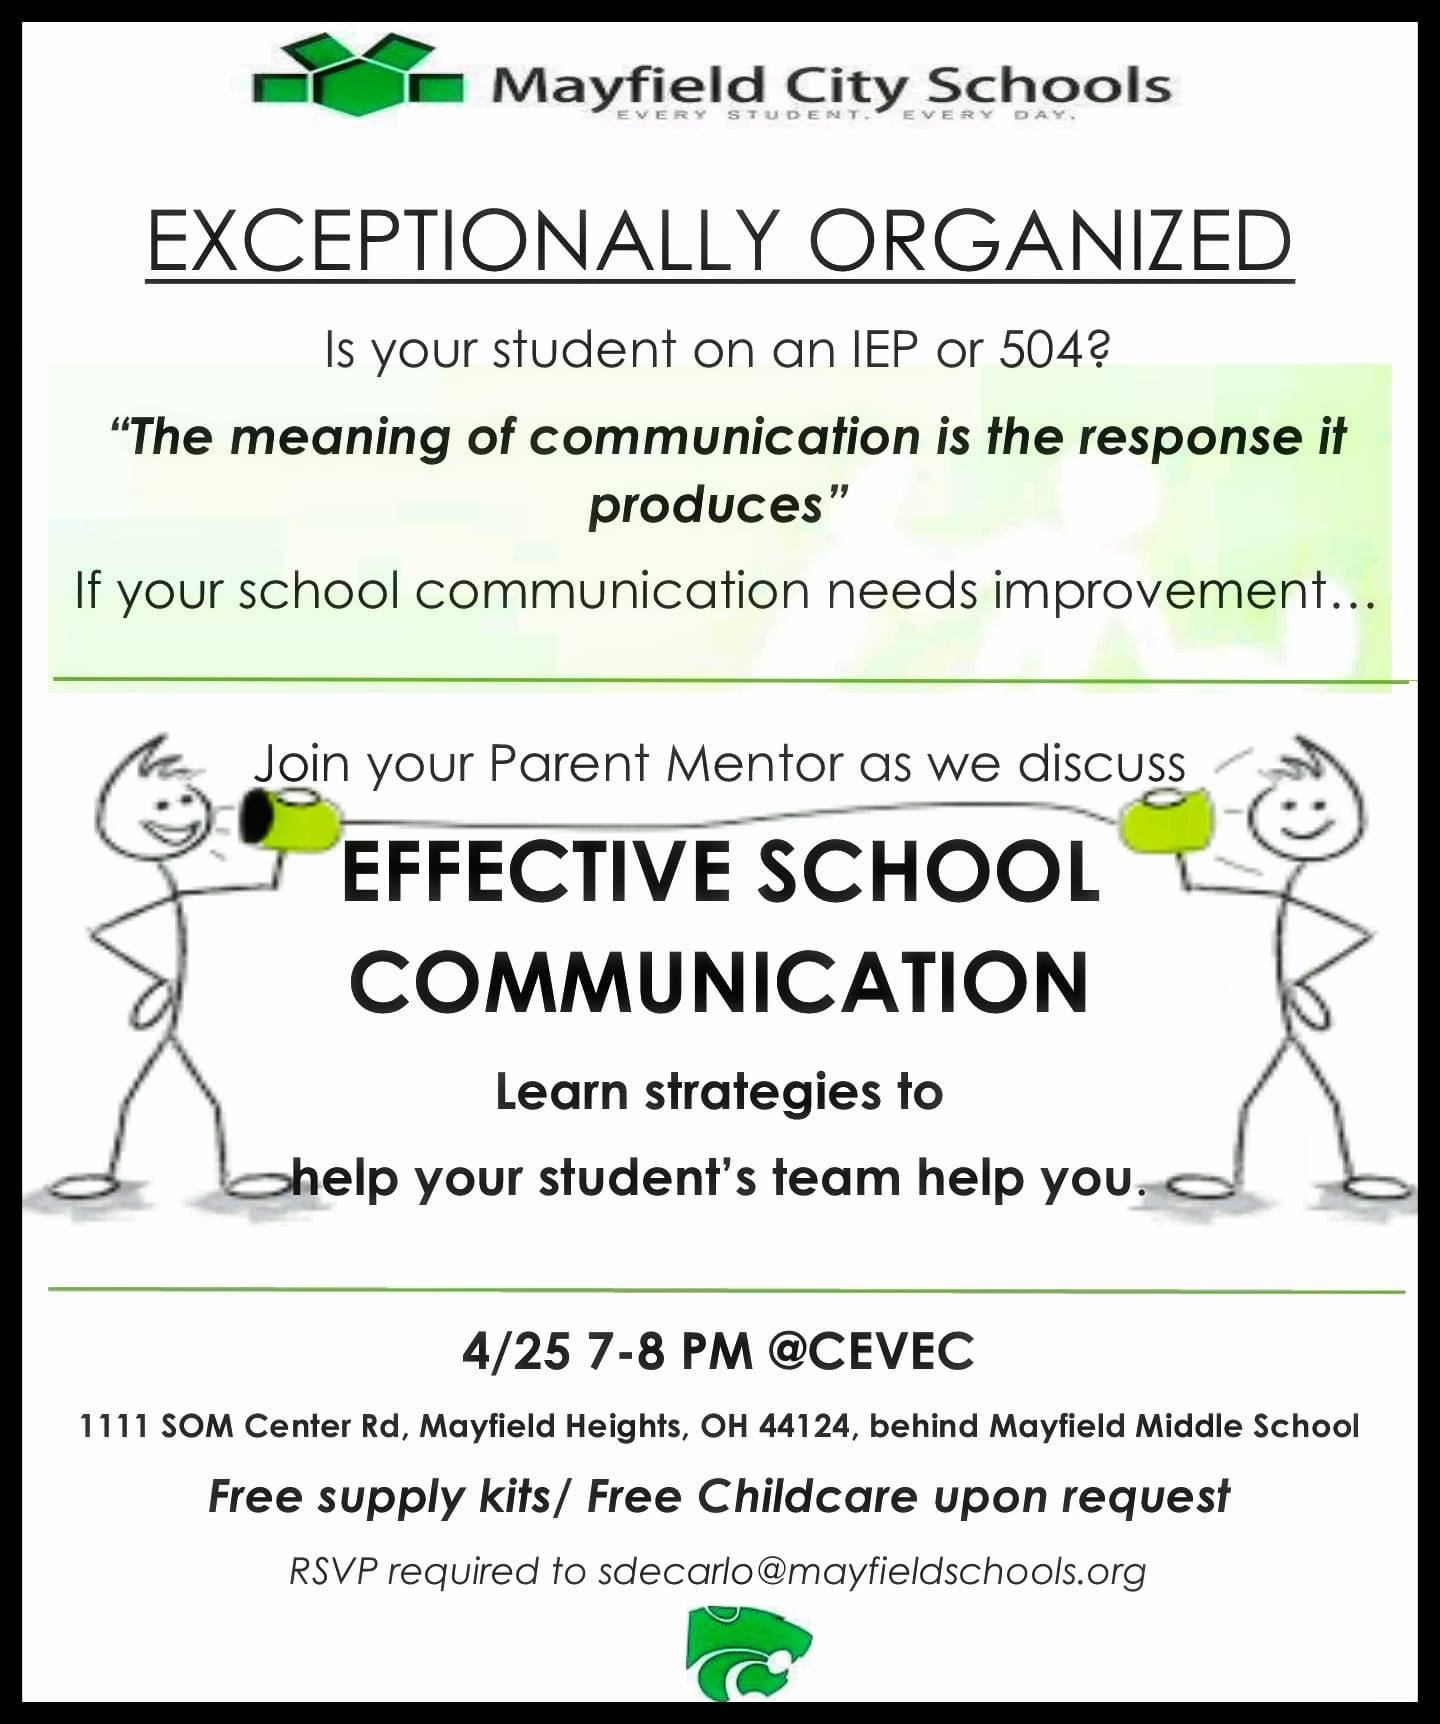 Effective School Communication